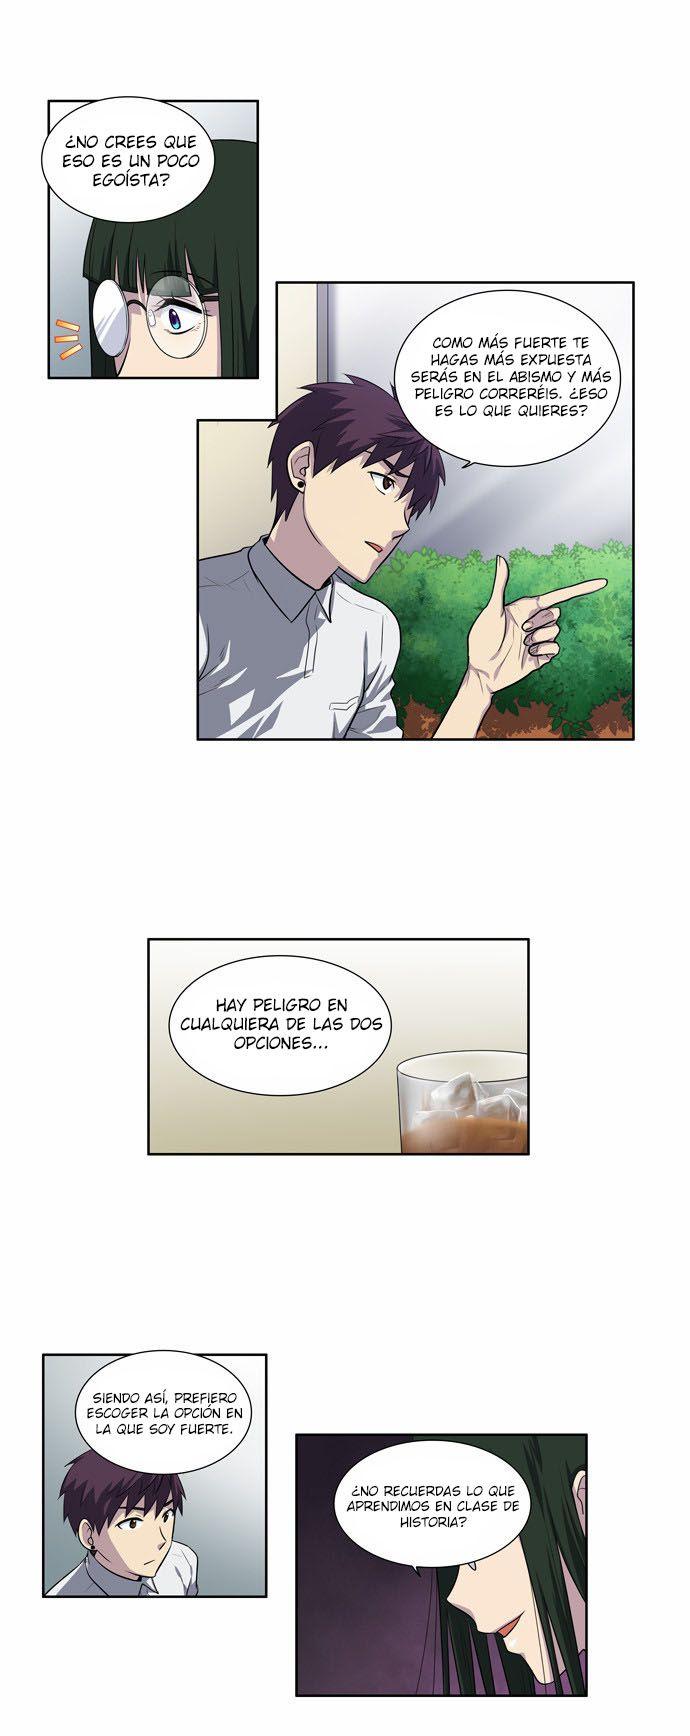 http://c5.ninemanga.com/es_manga/61/1725/474226/1c1b844e81f60edc6af816d8949a07b0.jpg Page 7